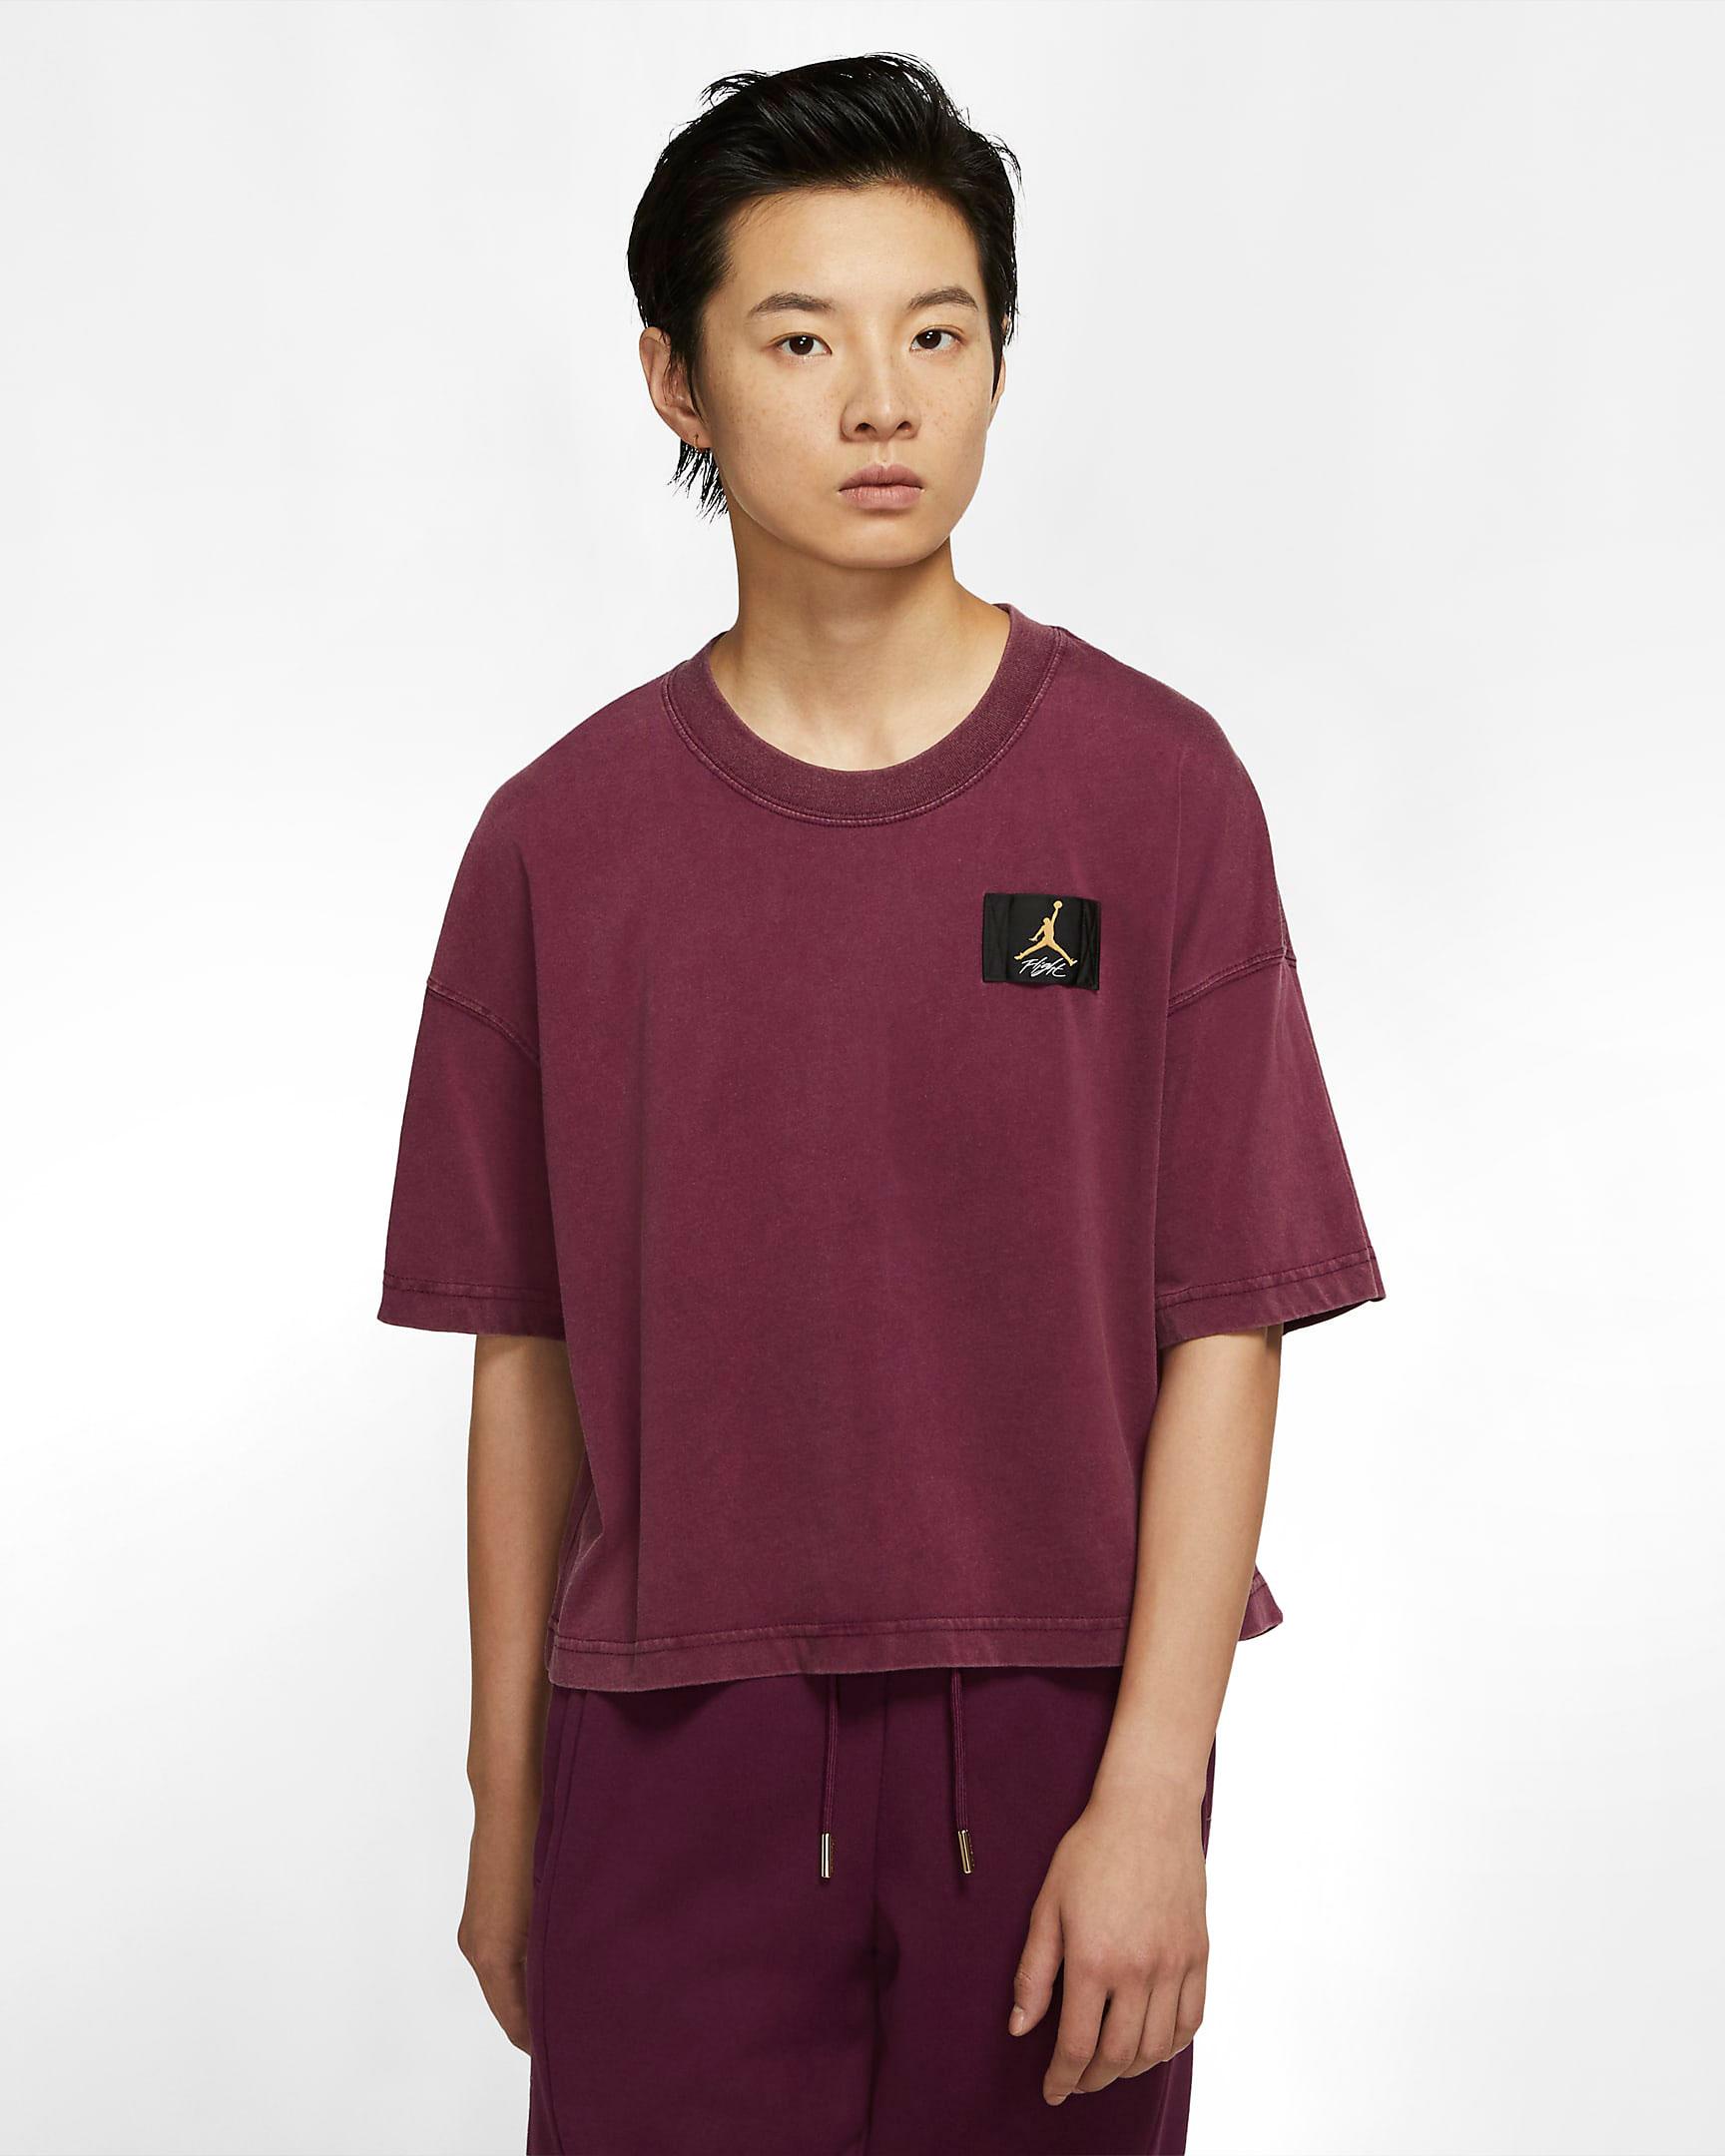 air-jordan-8-burgundy-beetroot-womens-jordan-shirt